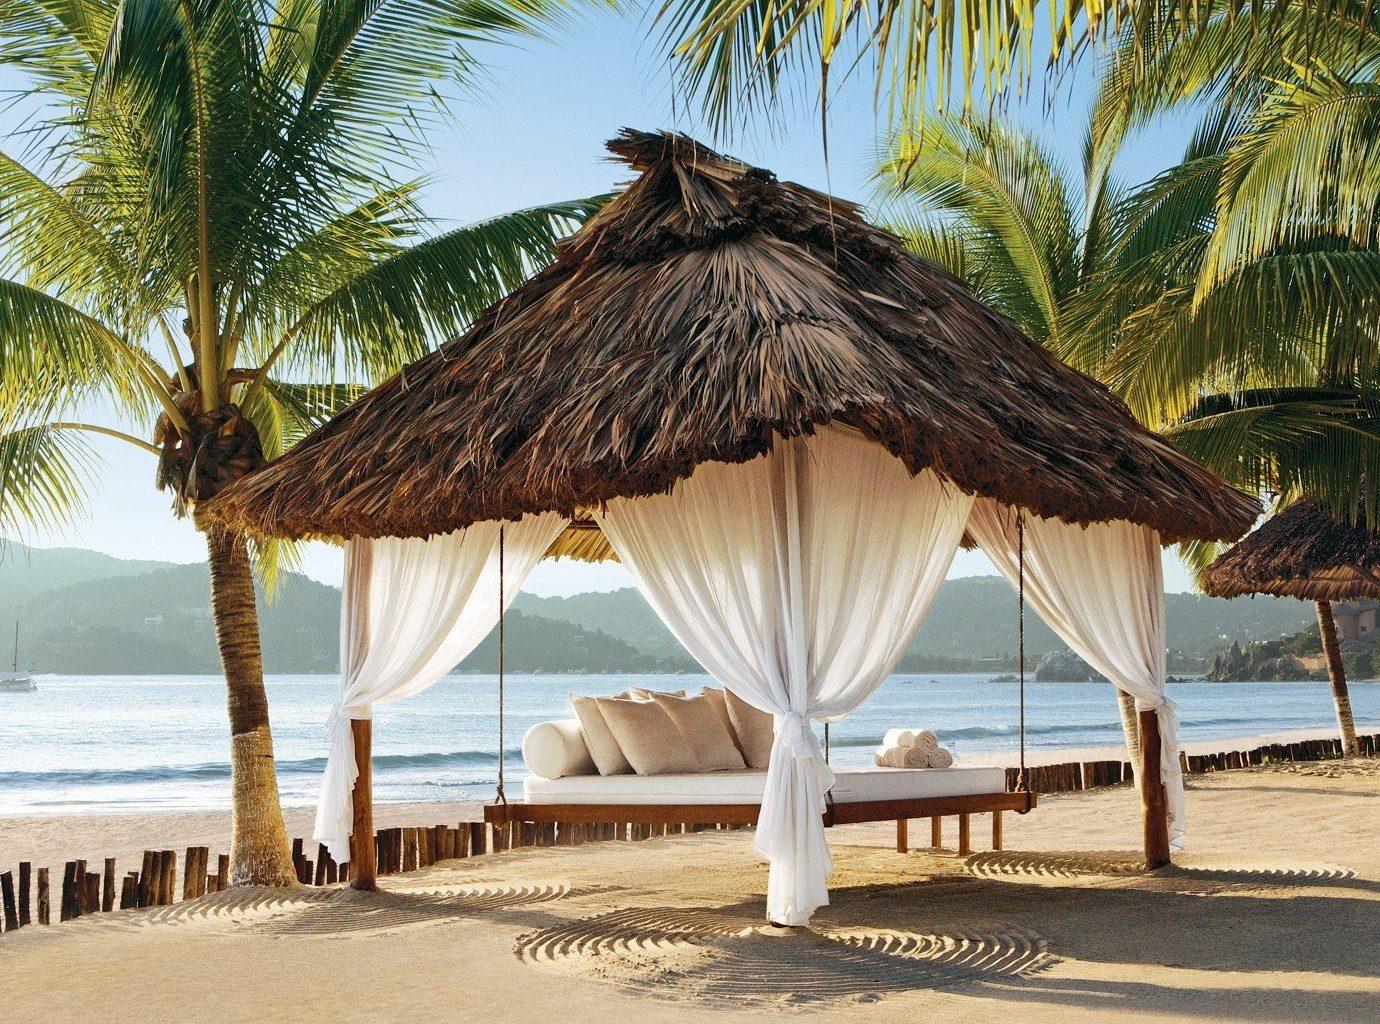 Zihuatanejo mexico lawn hut on sandy beach